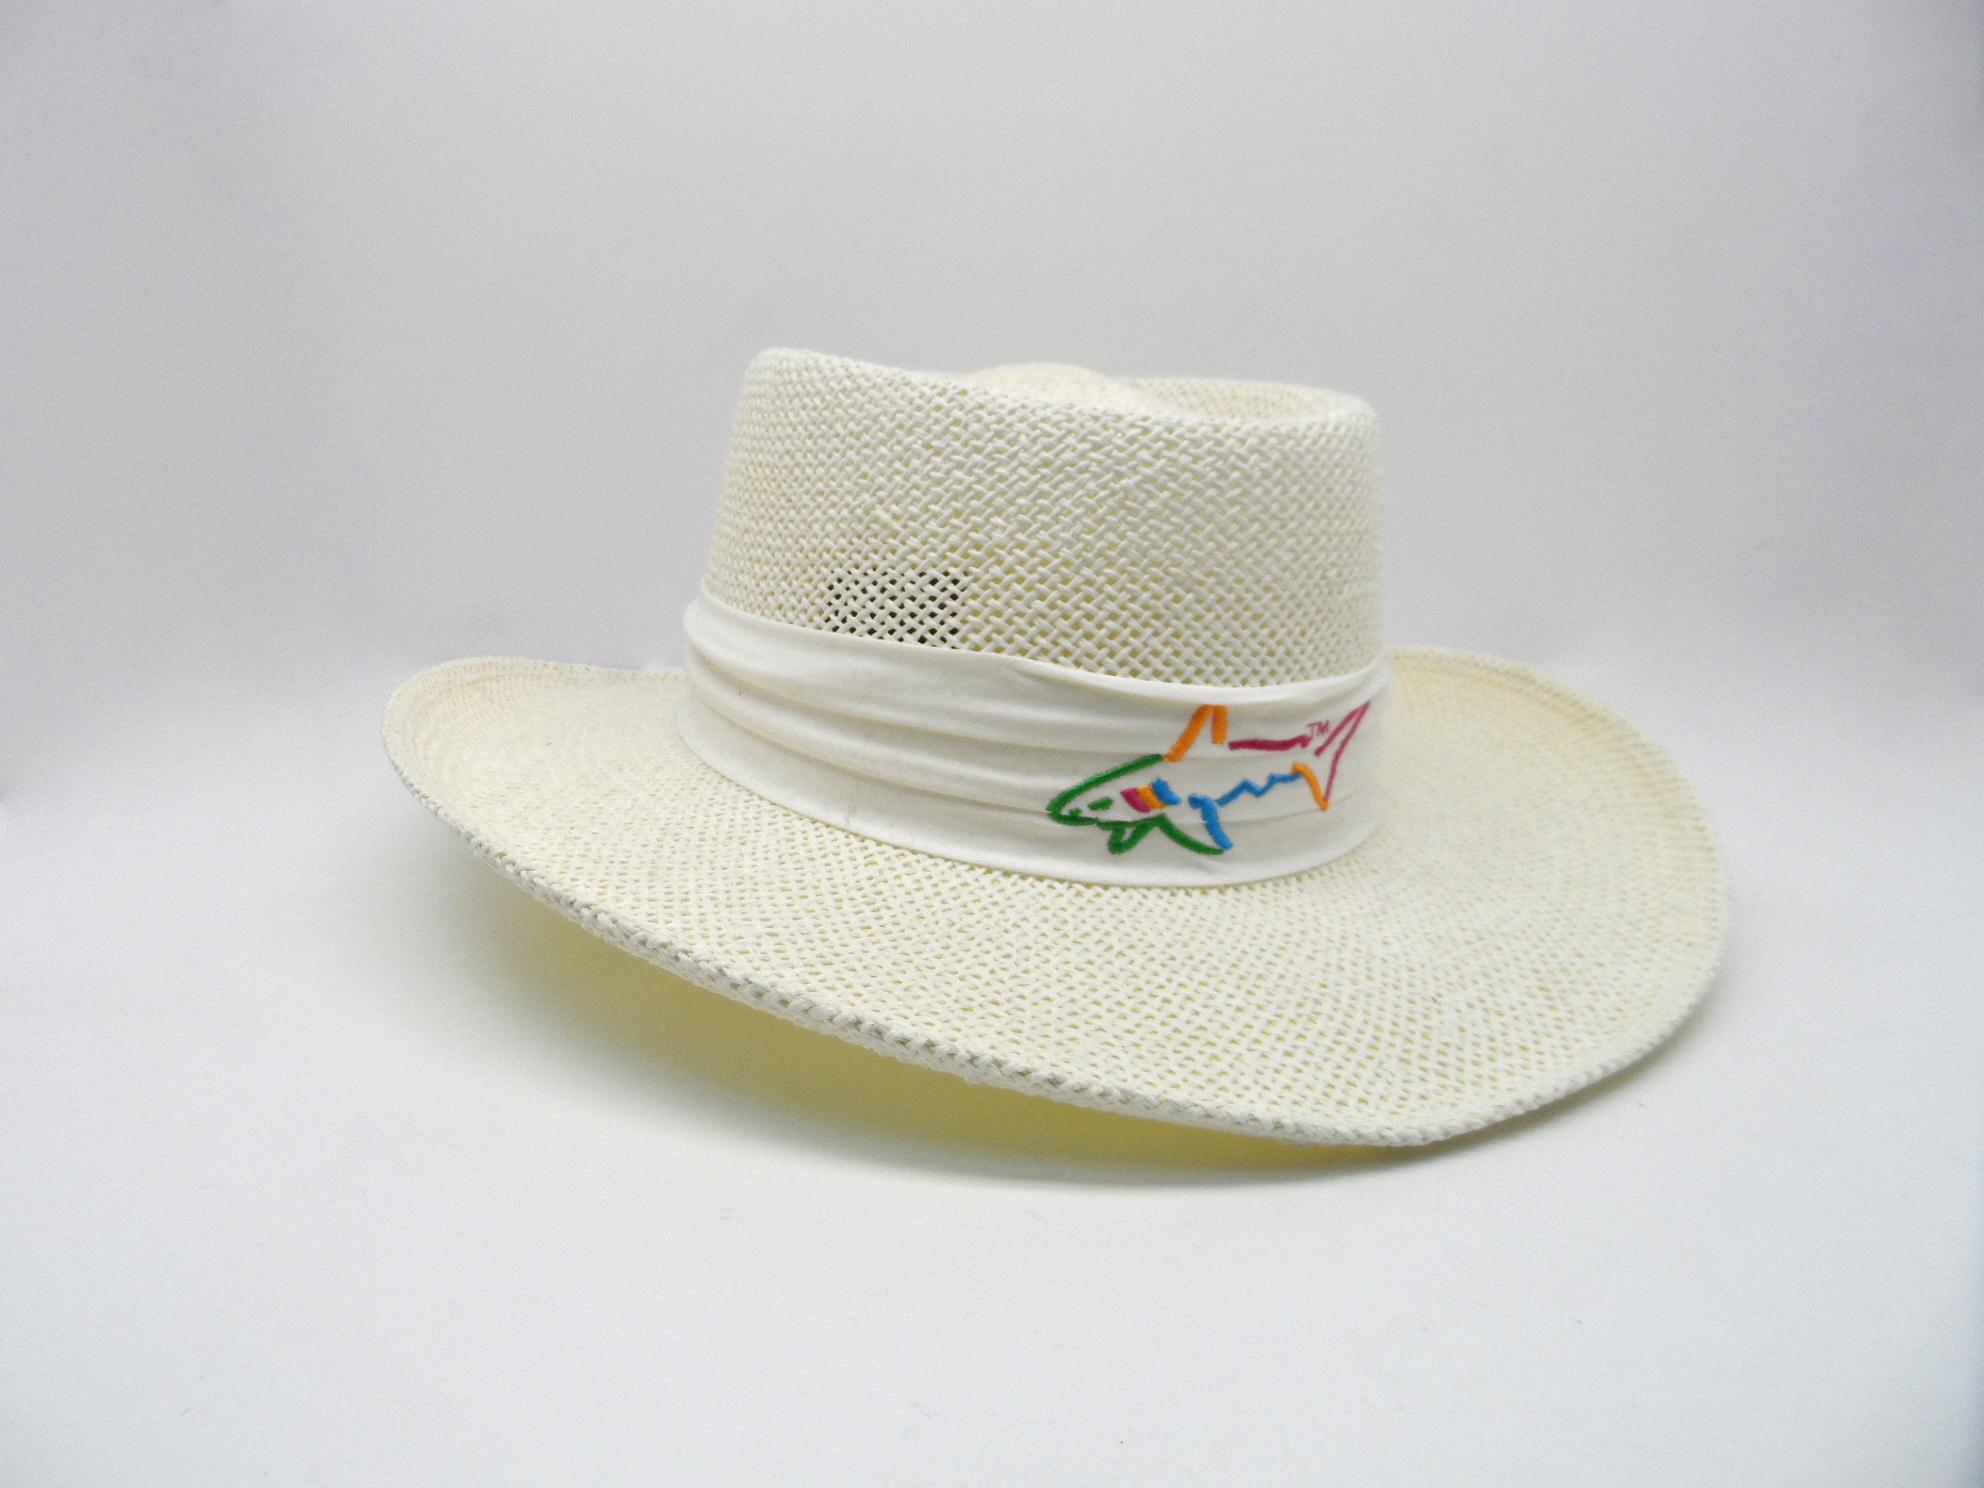 Greg norman collection men shark logo band straw golf jpg 1984x1488 Greg  norman straw hat white 80fa61f91fbd